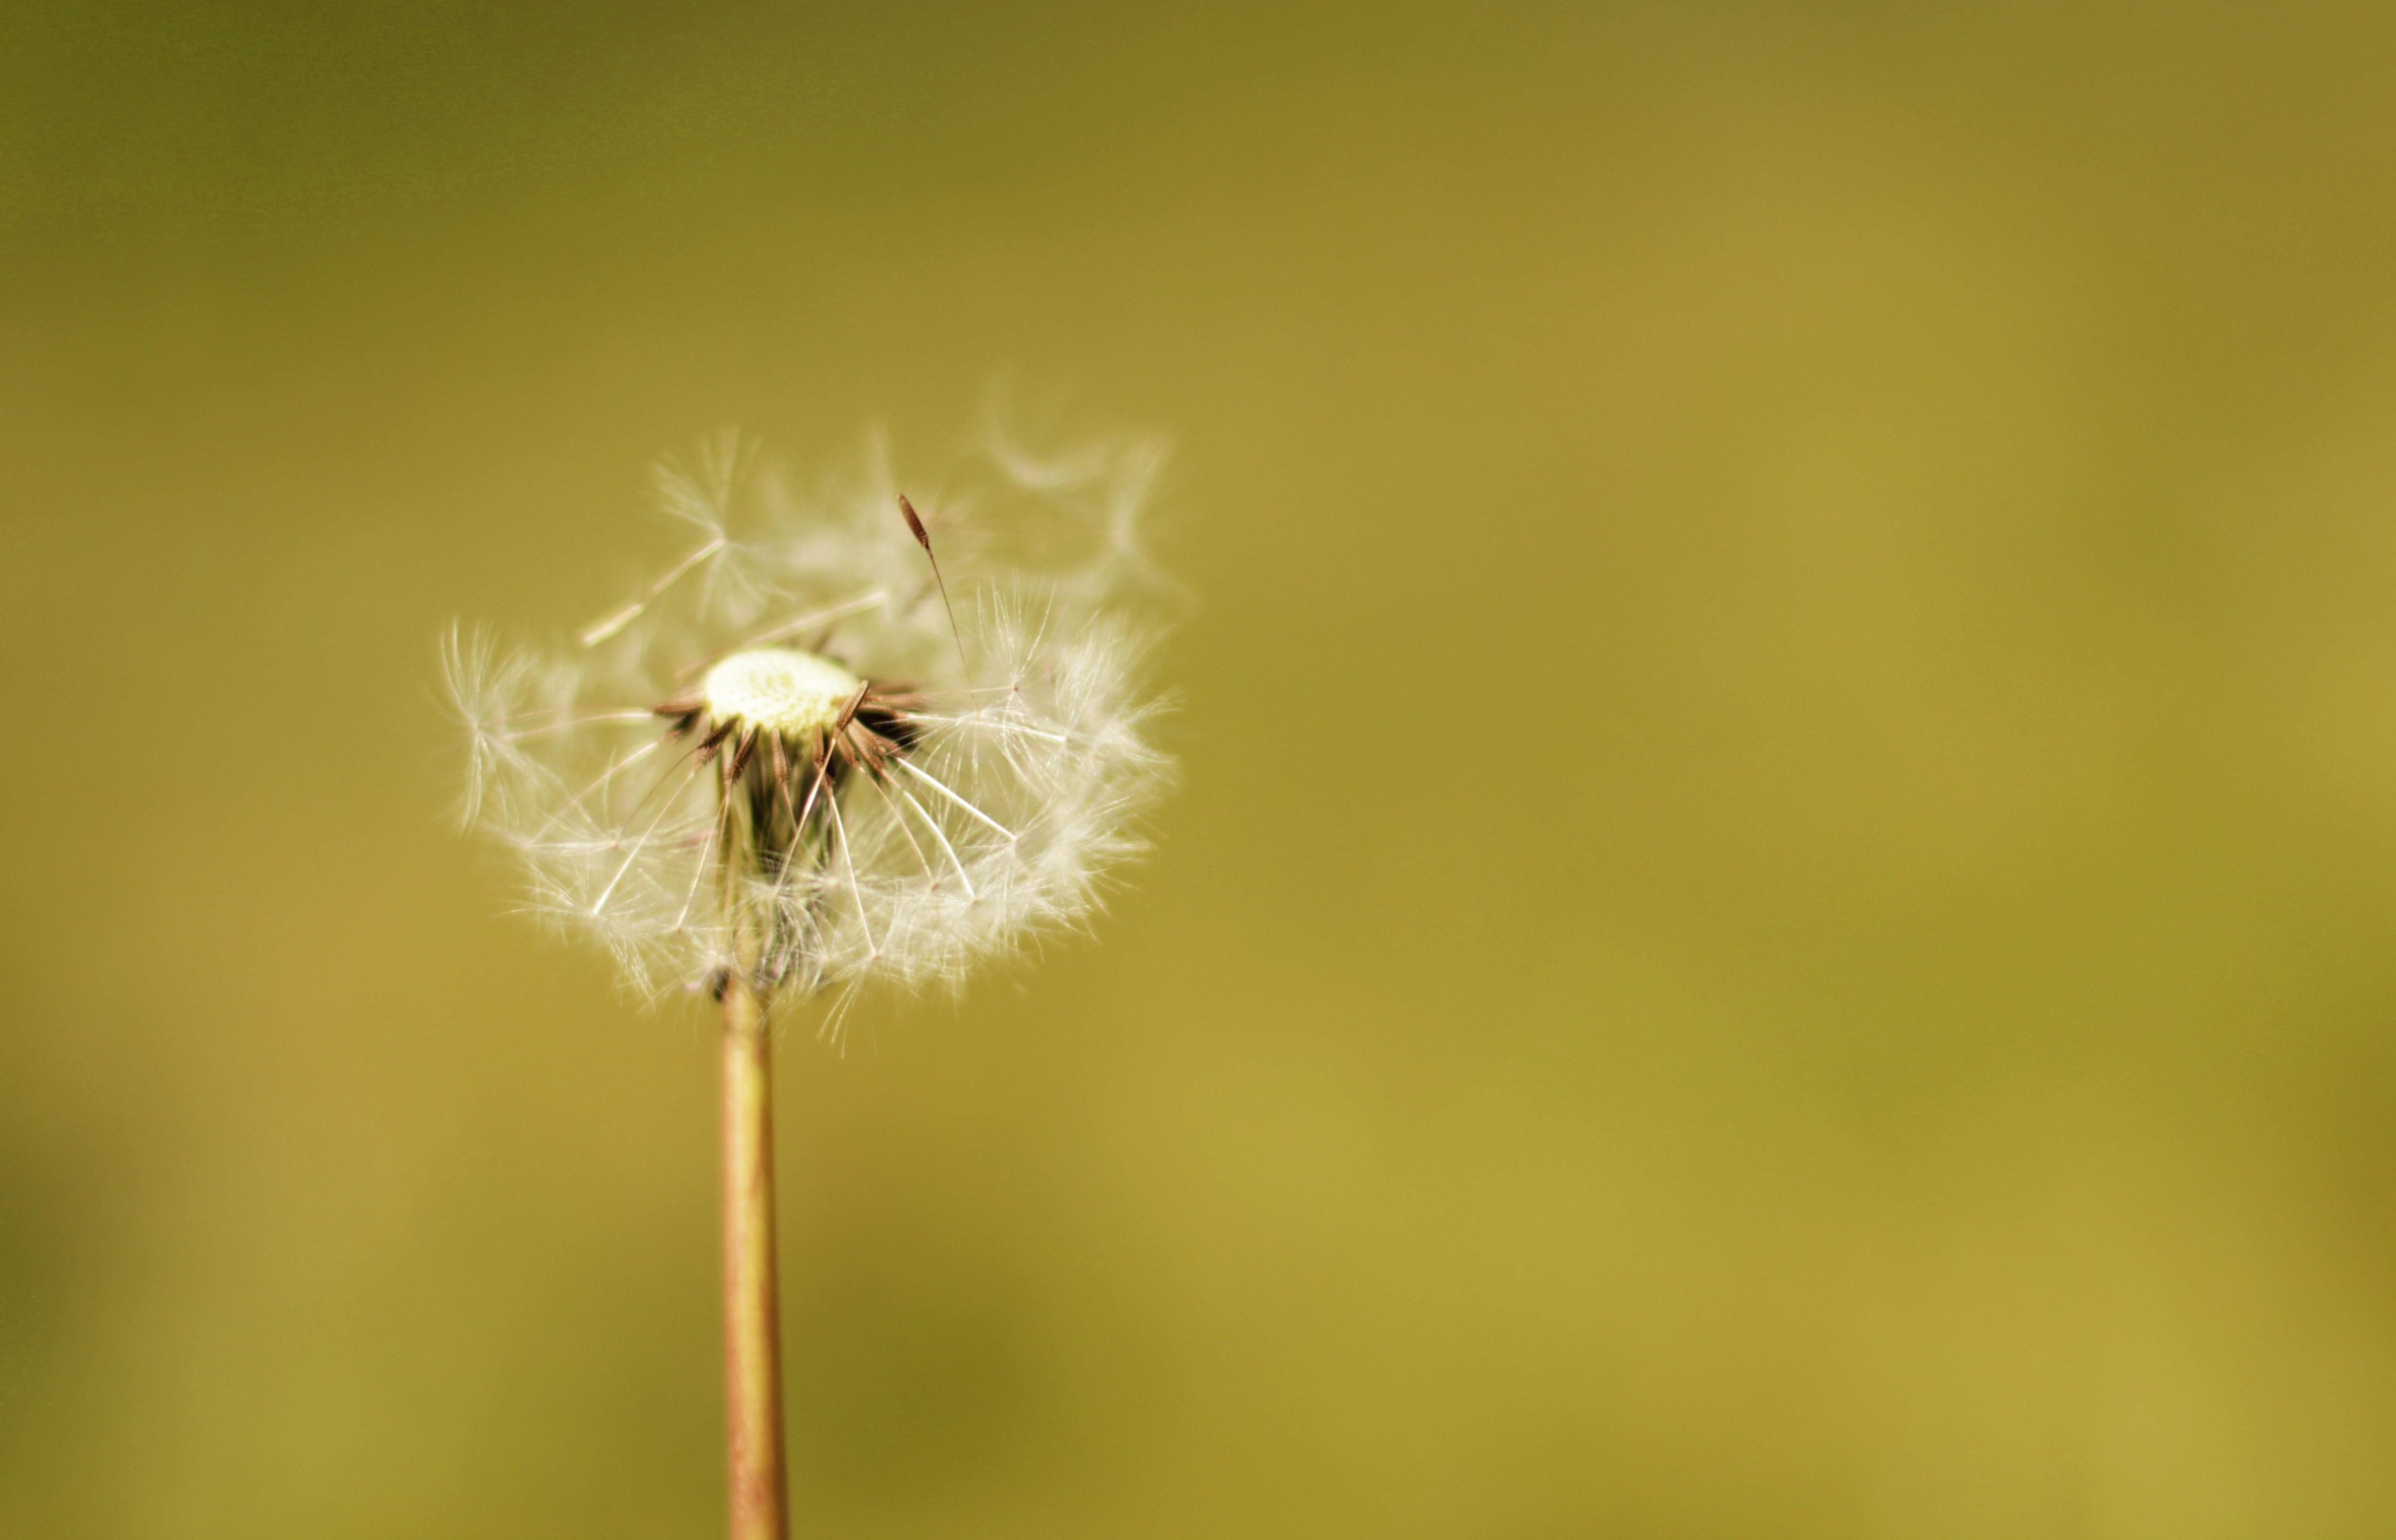 Free Stock Photo Of Dandelion Puffball